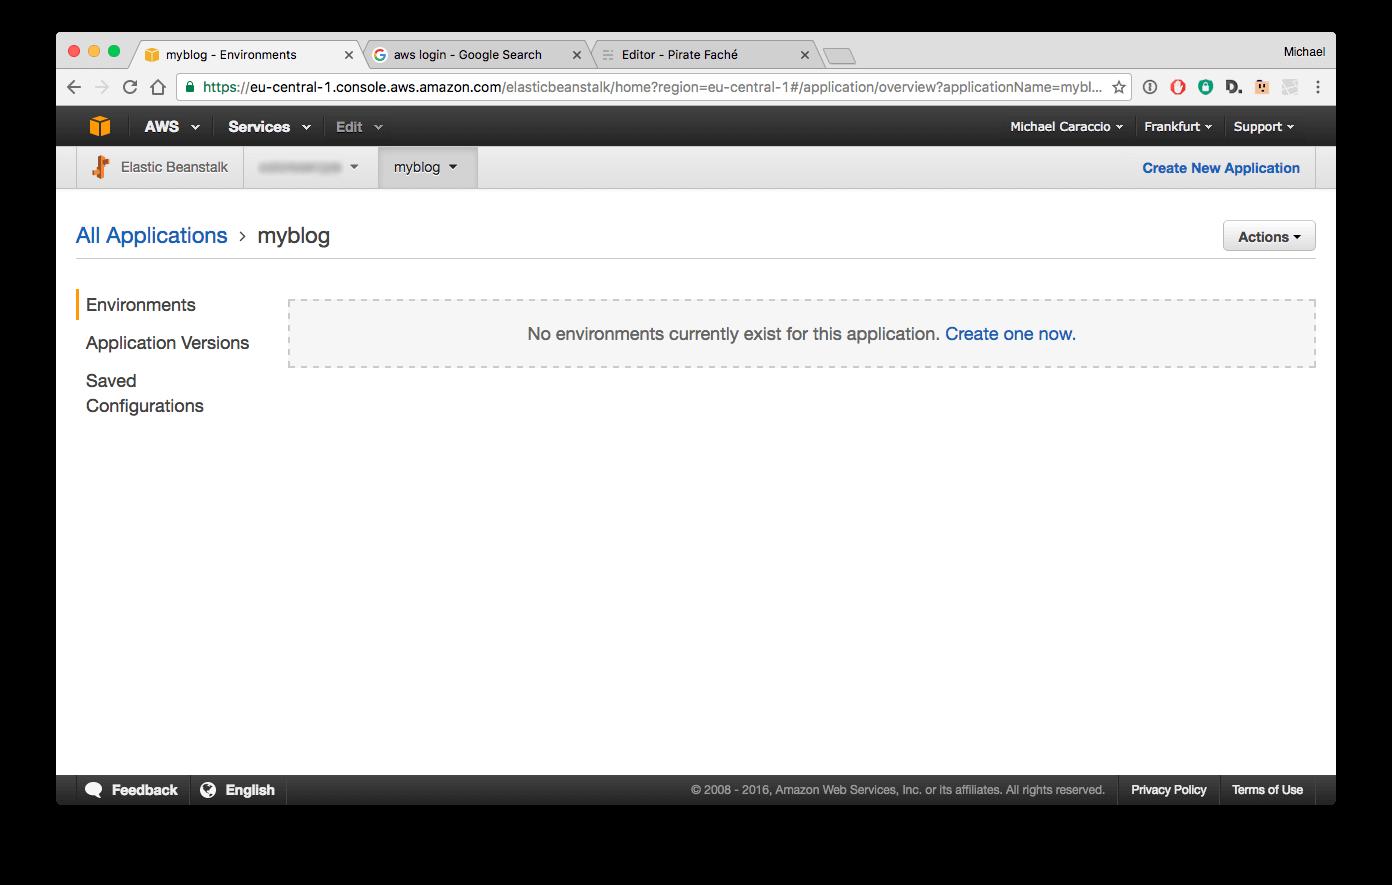 AWS new application